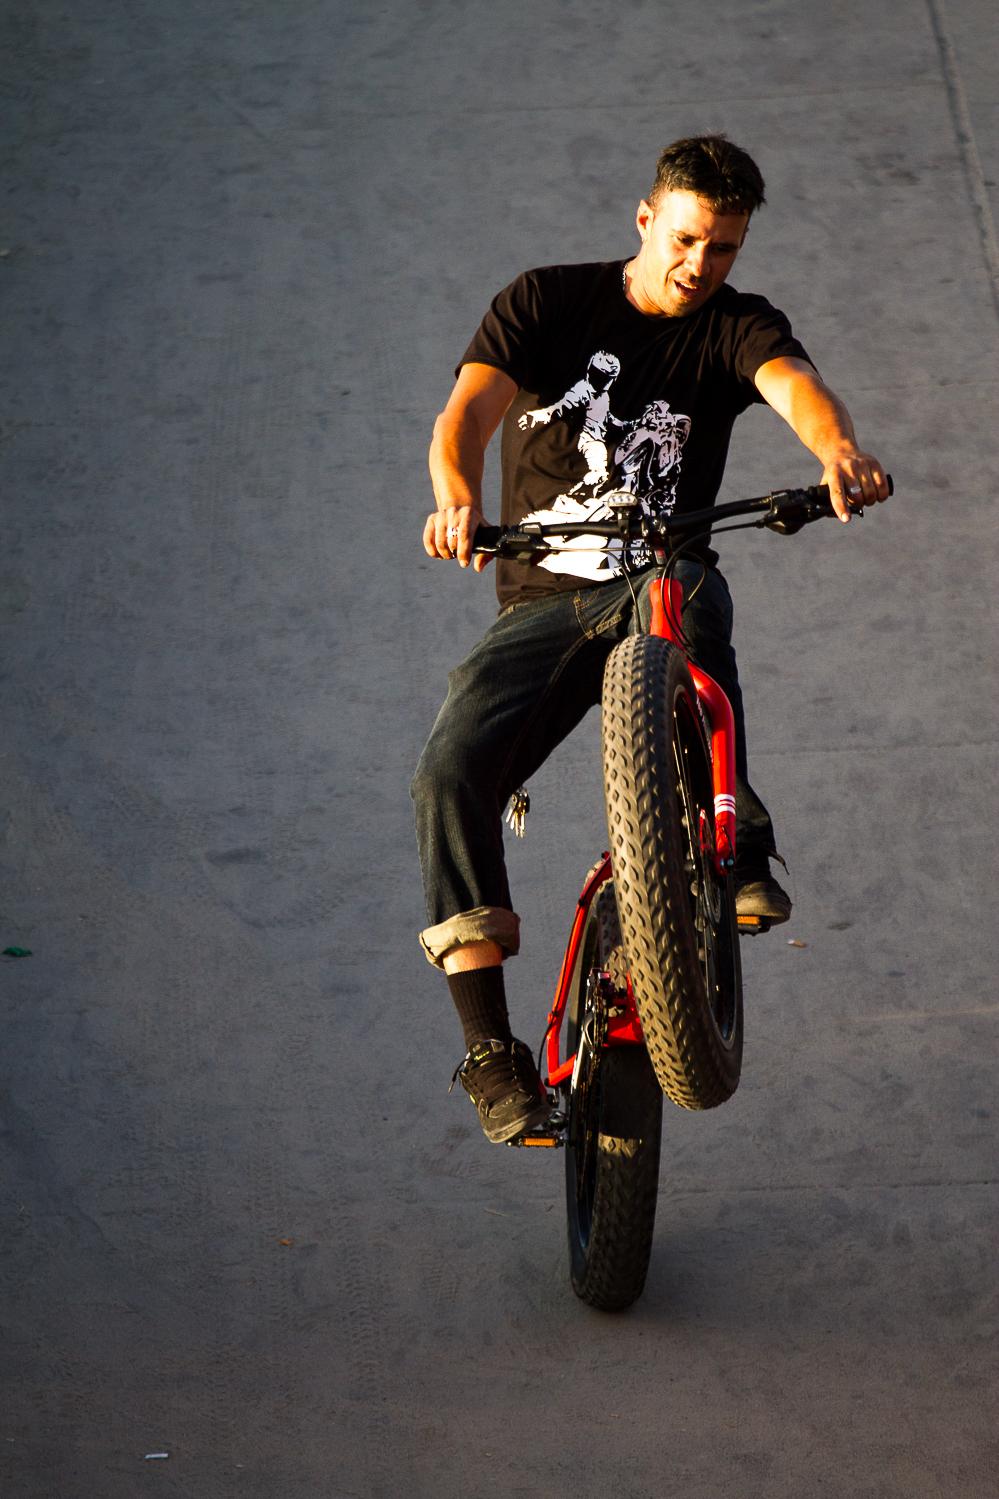 Stunt-1-3